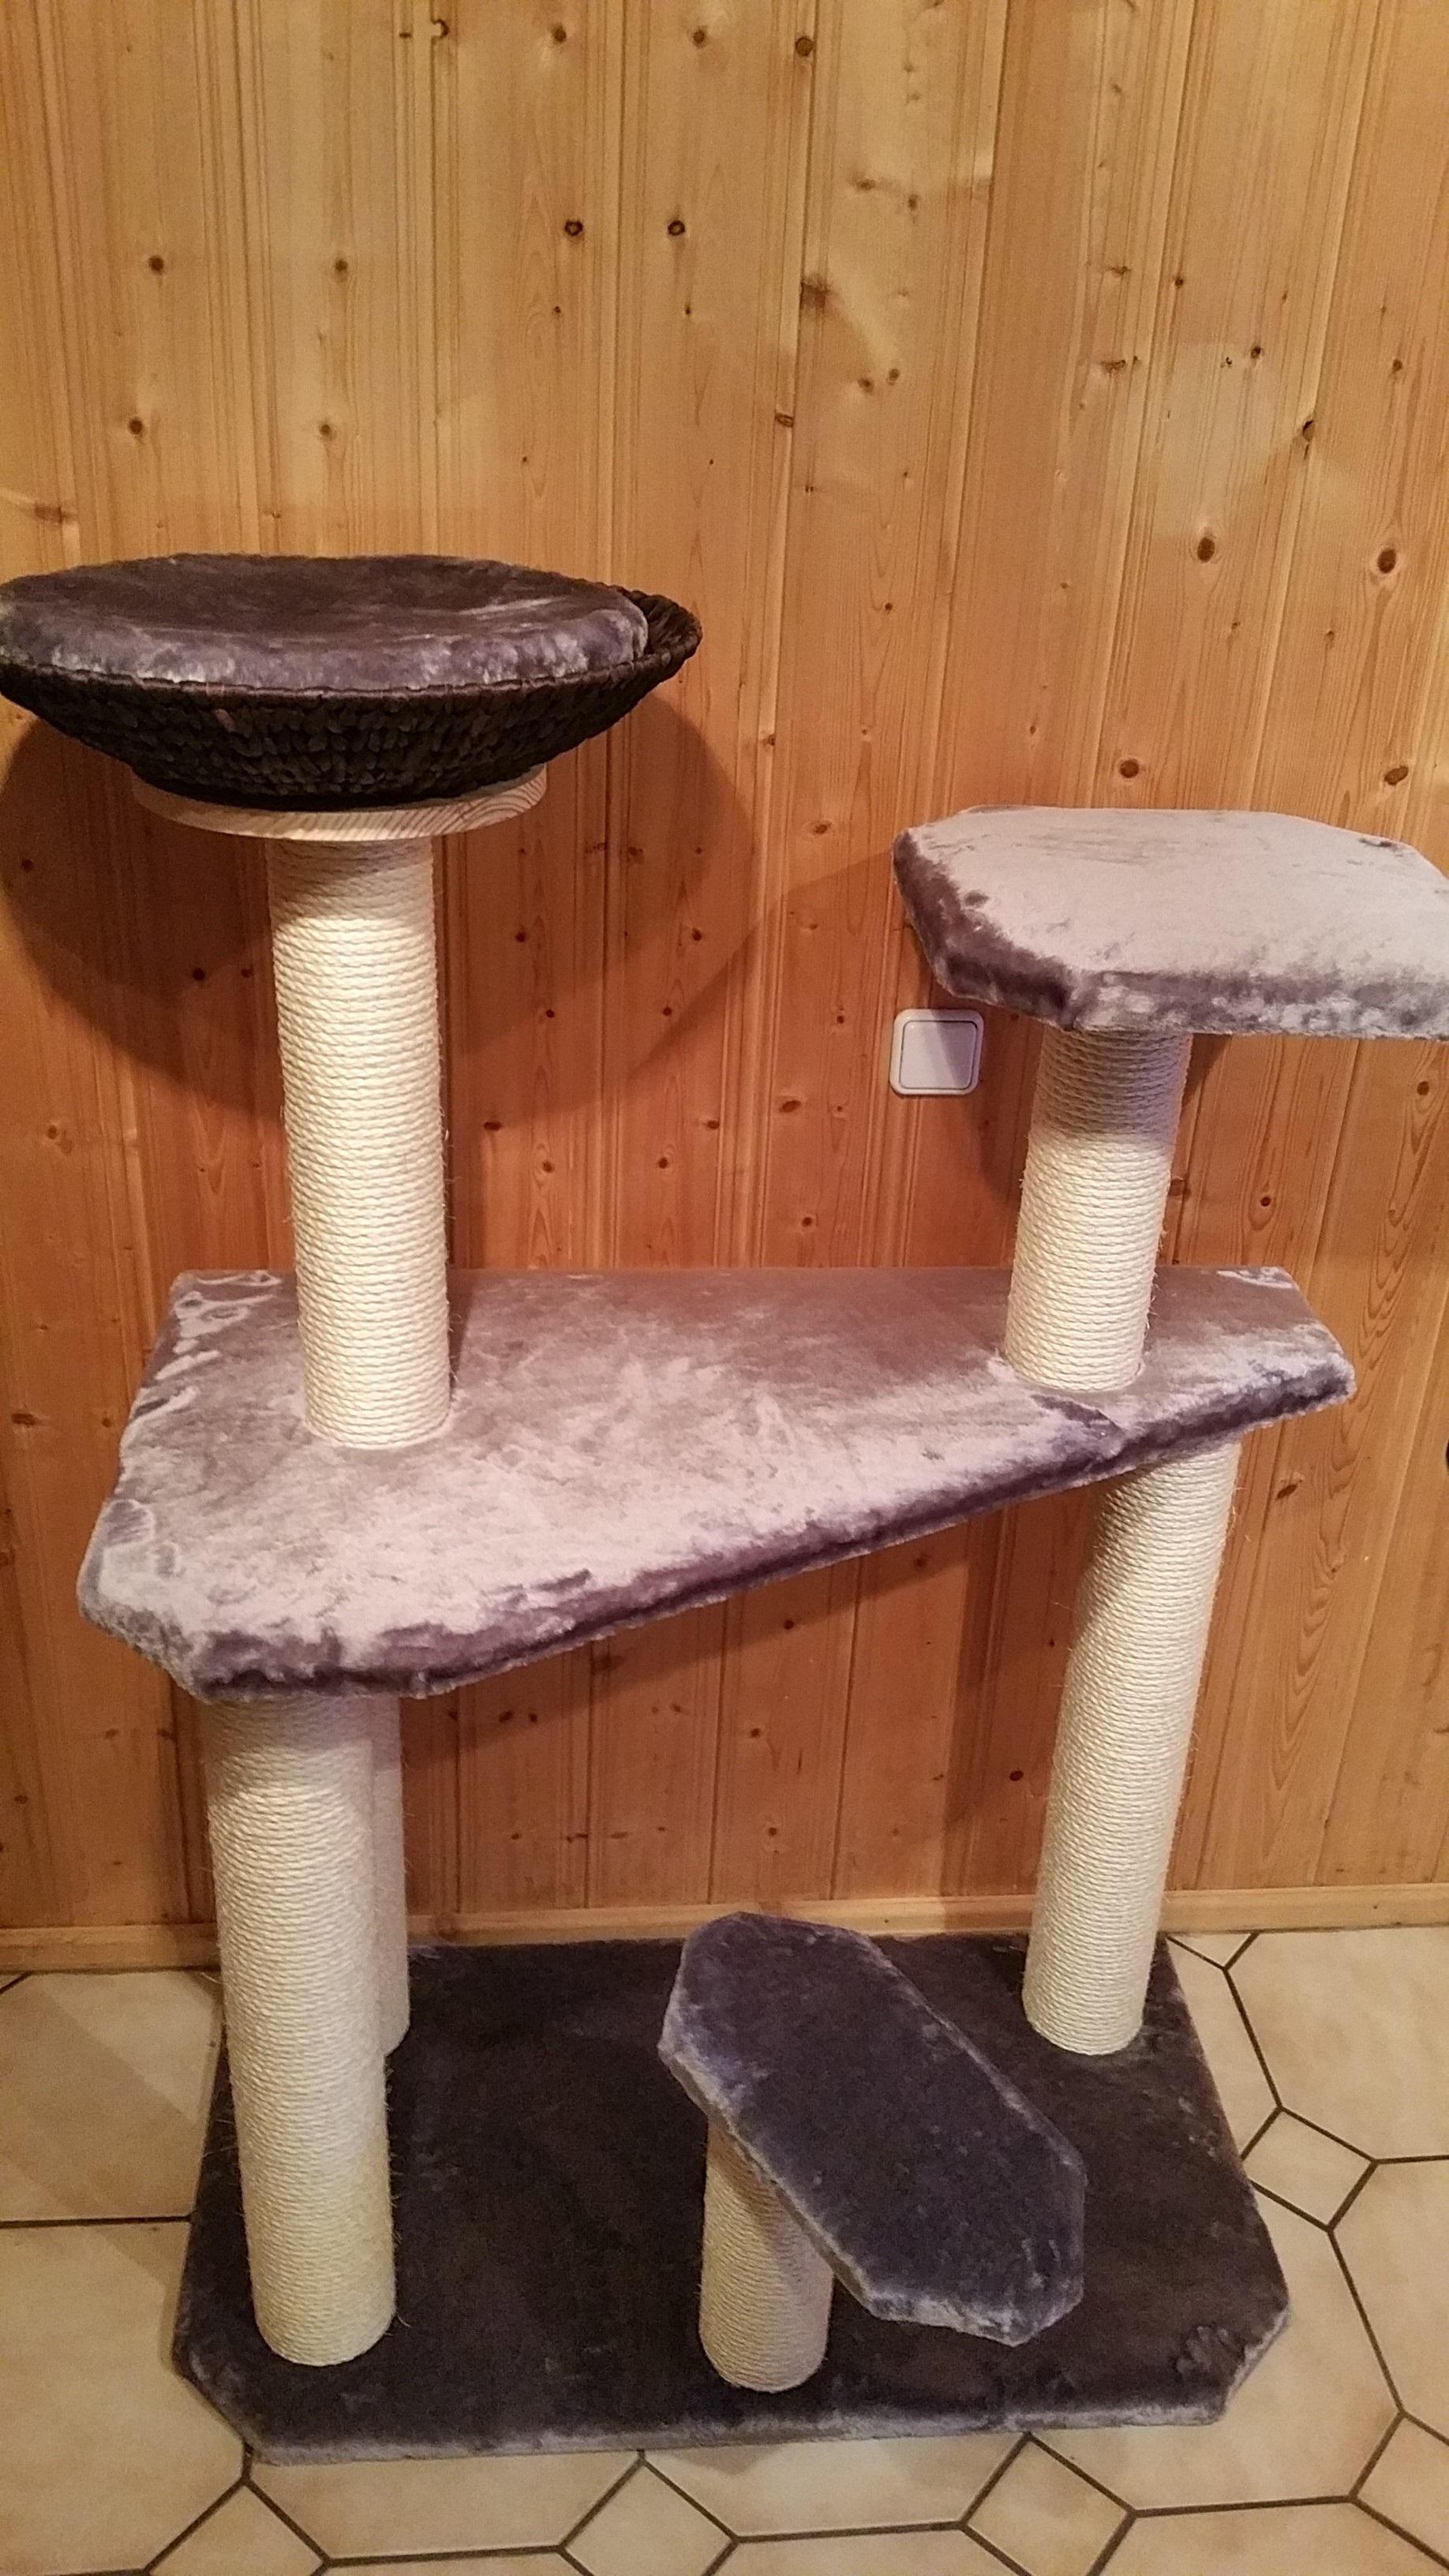 kratzbaum massiv katzenbaum liegemulde f r katzen sisalst mme. Black Bedroom Furniture Sets. Home Design Ideas